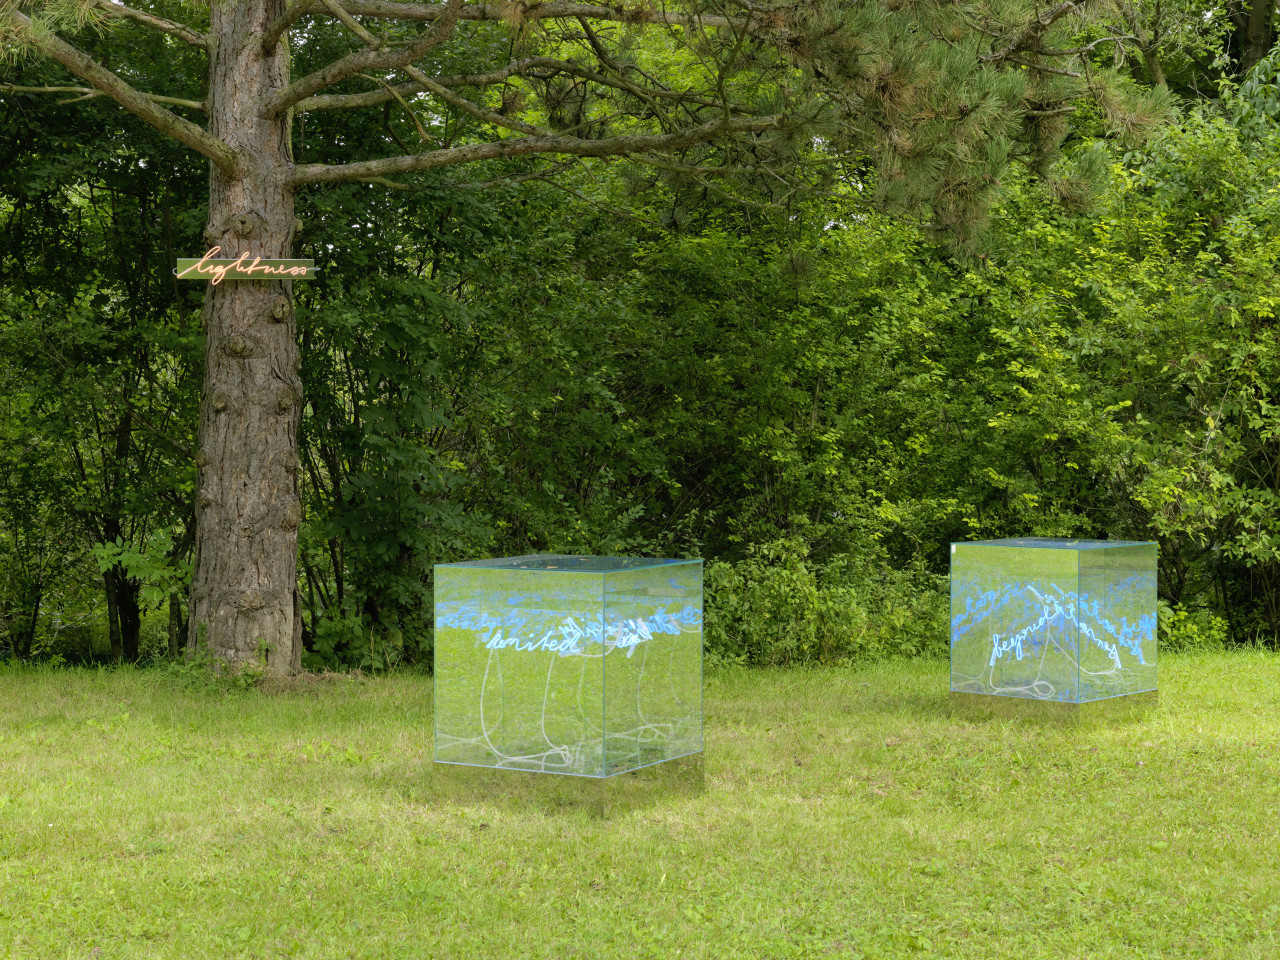 Sculpture Garden, Installation view: Brigitte Kowanz, 2019 Photo: © FARBPRAXIS